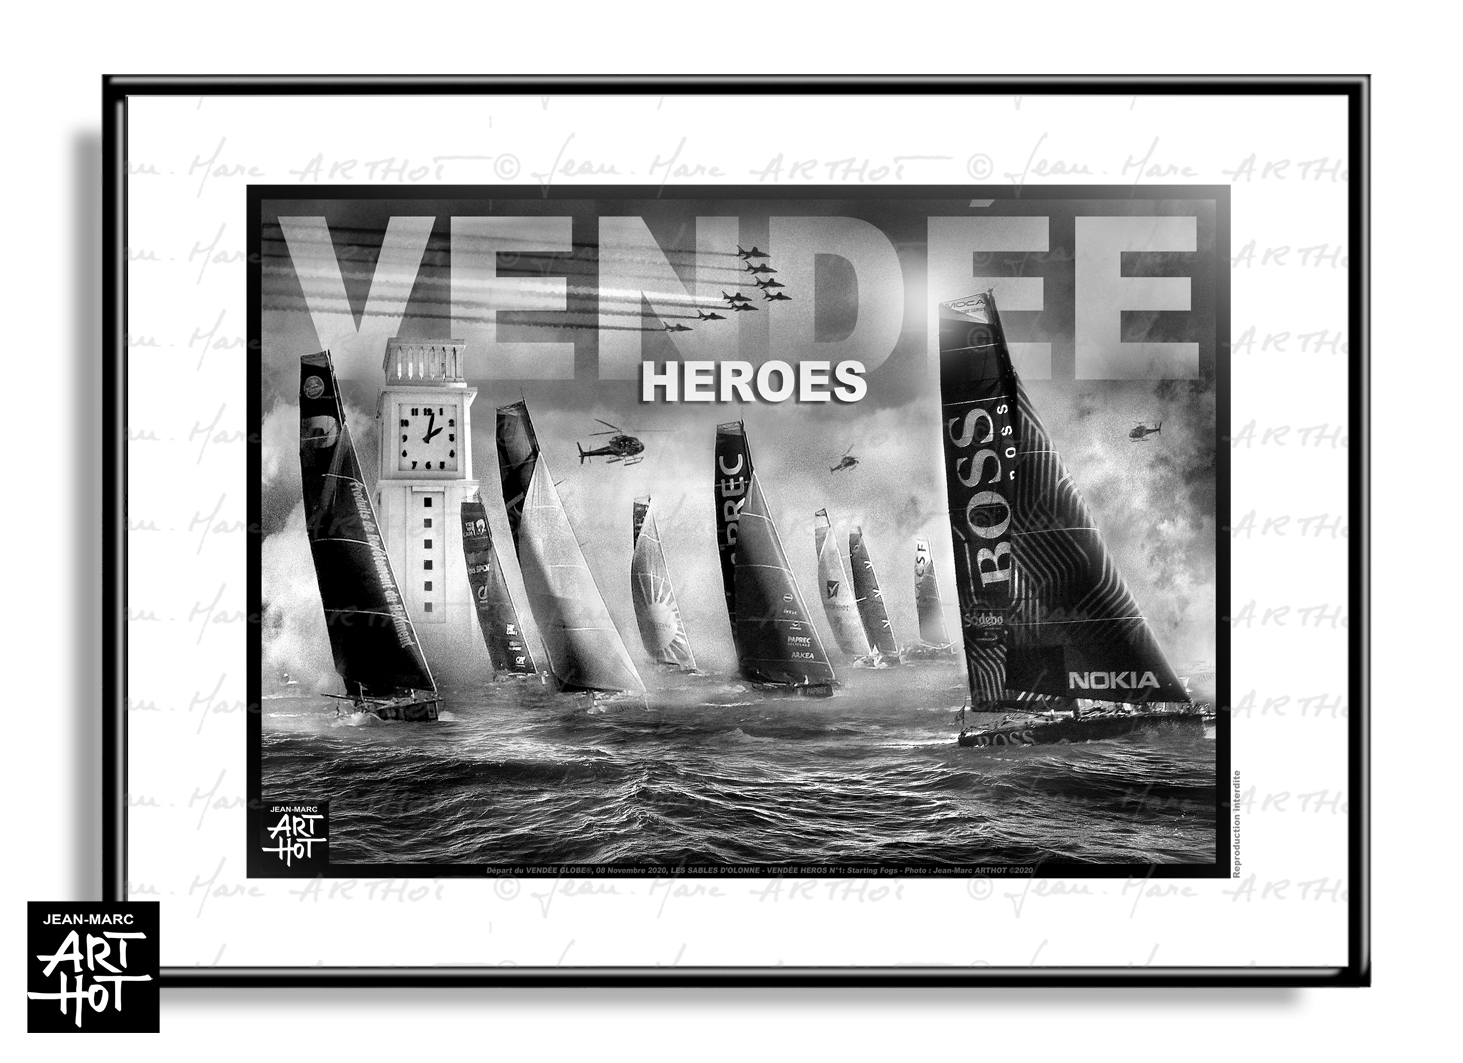 AFFICHE VENDÉE HEROES N°01 - Starting Fogs